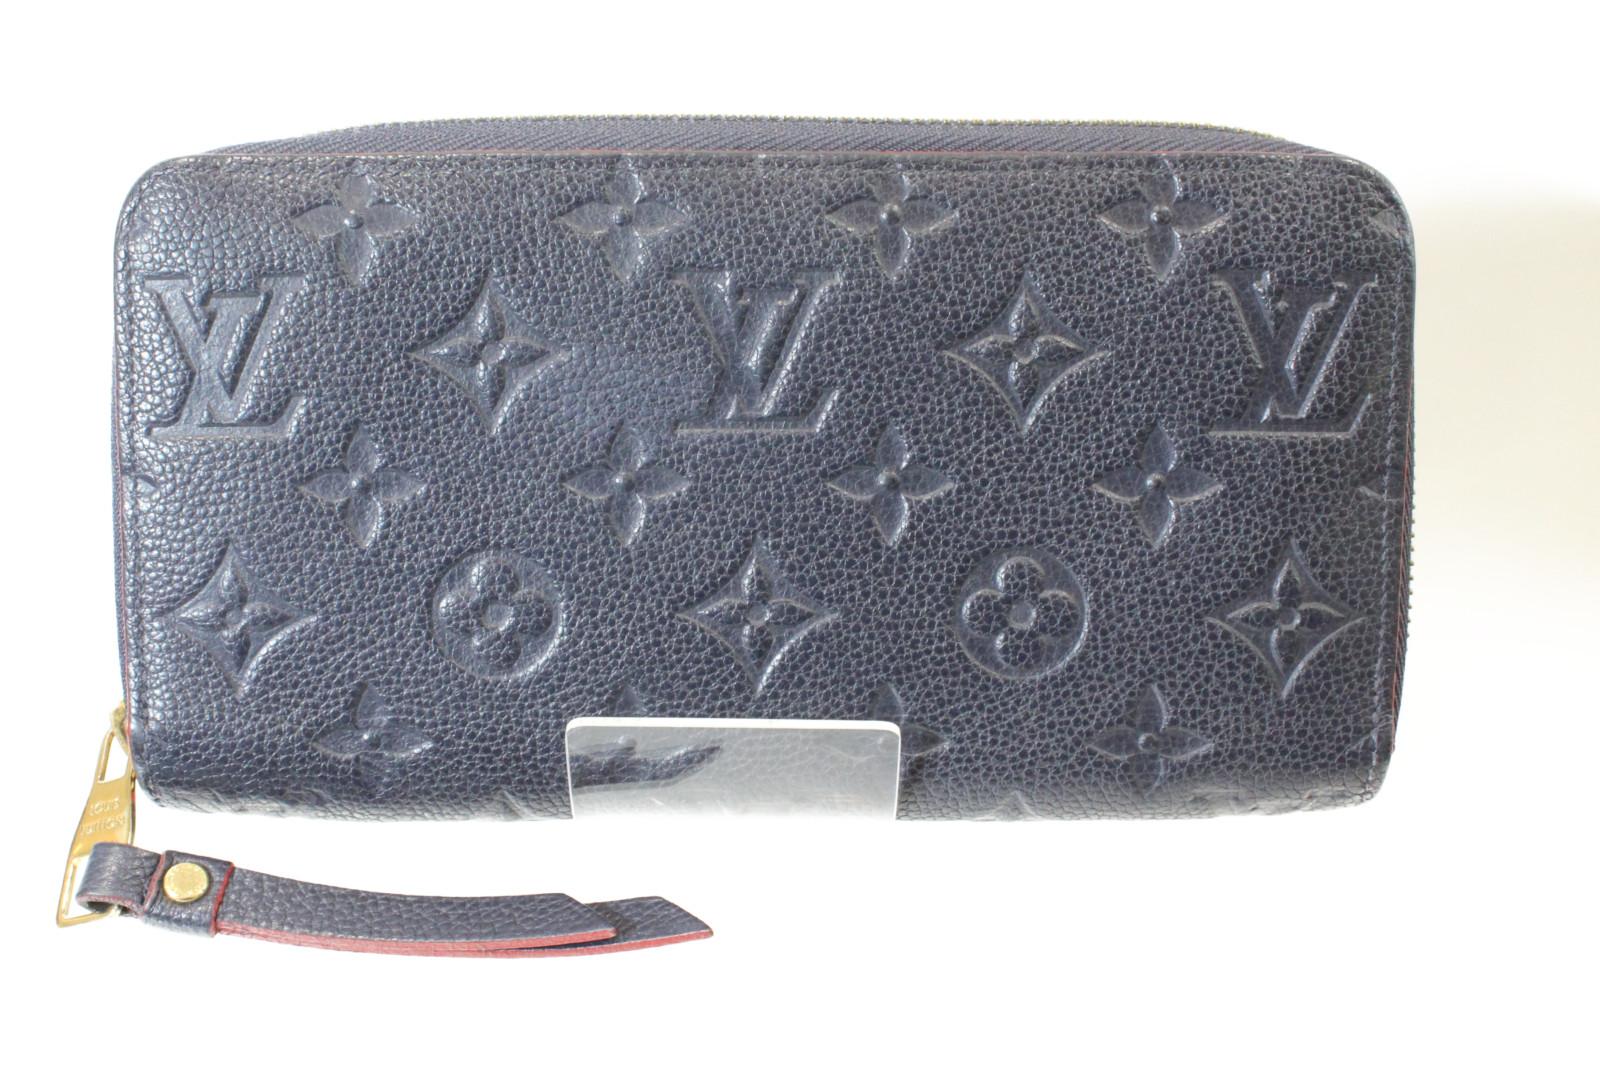 LOUIS VUITTON ルイヴィトンジッピーウォレット M62121アンプラント 長財布 レザープレゼント包装可 【中古】